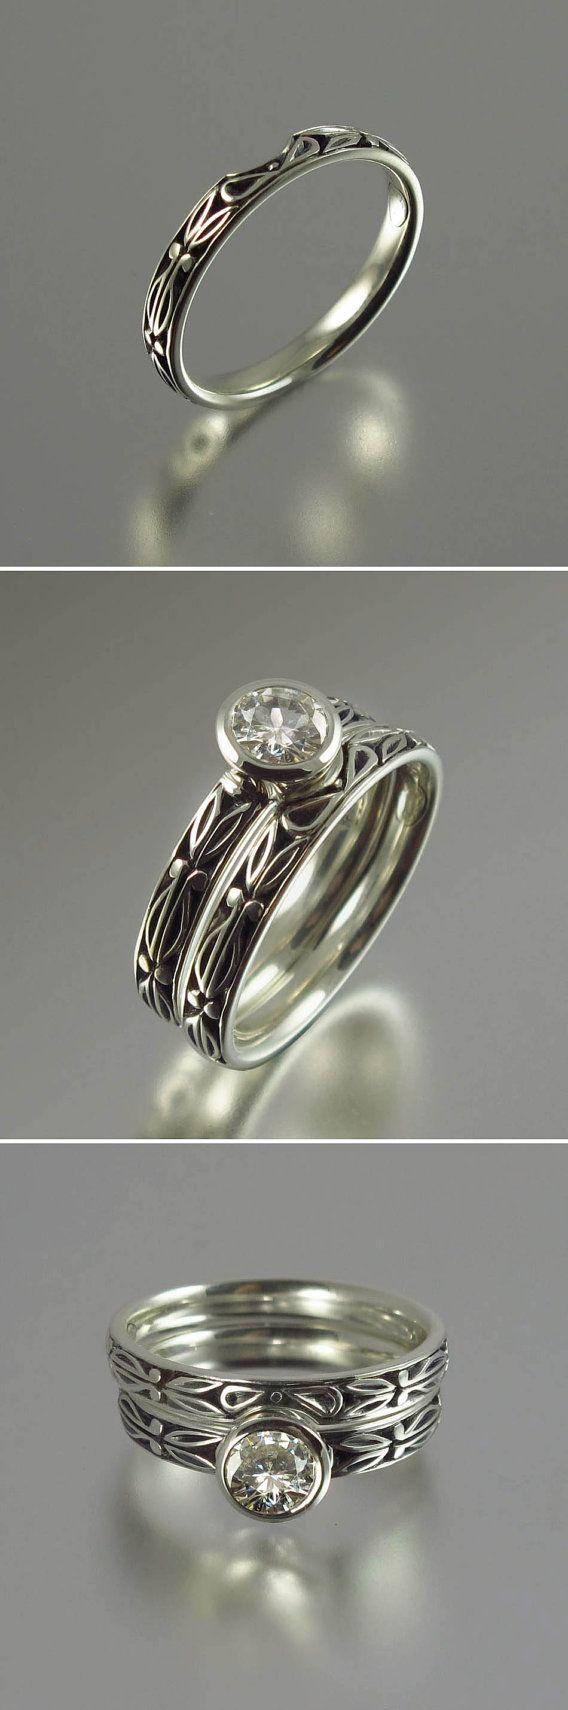 AUGUSTA 044ct Diamond 14K gold engagement ring by WingedLion, $1925.00